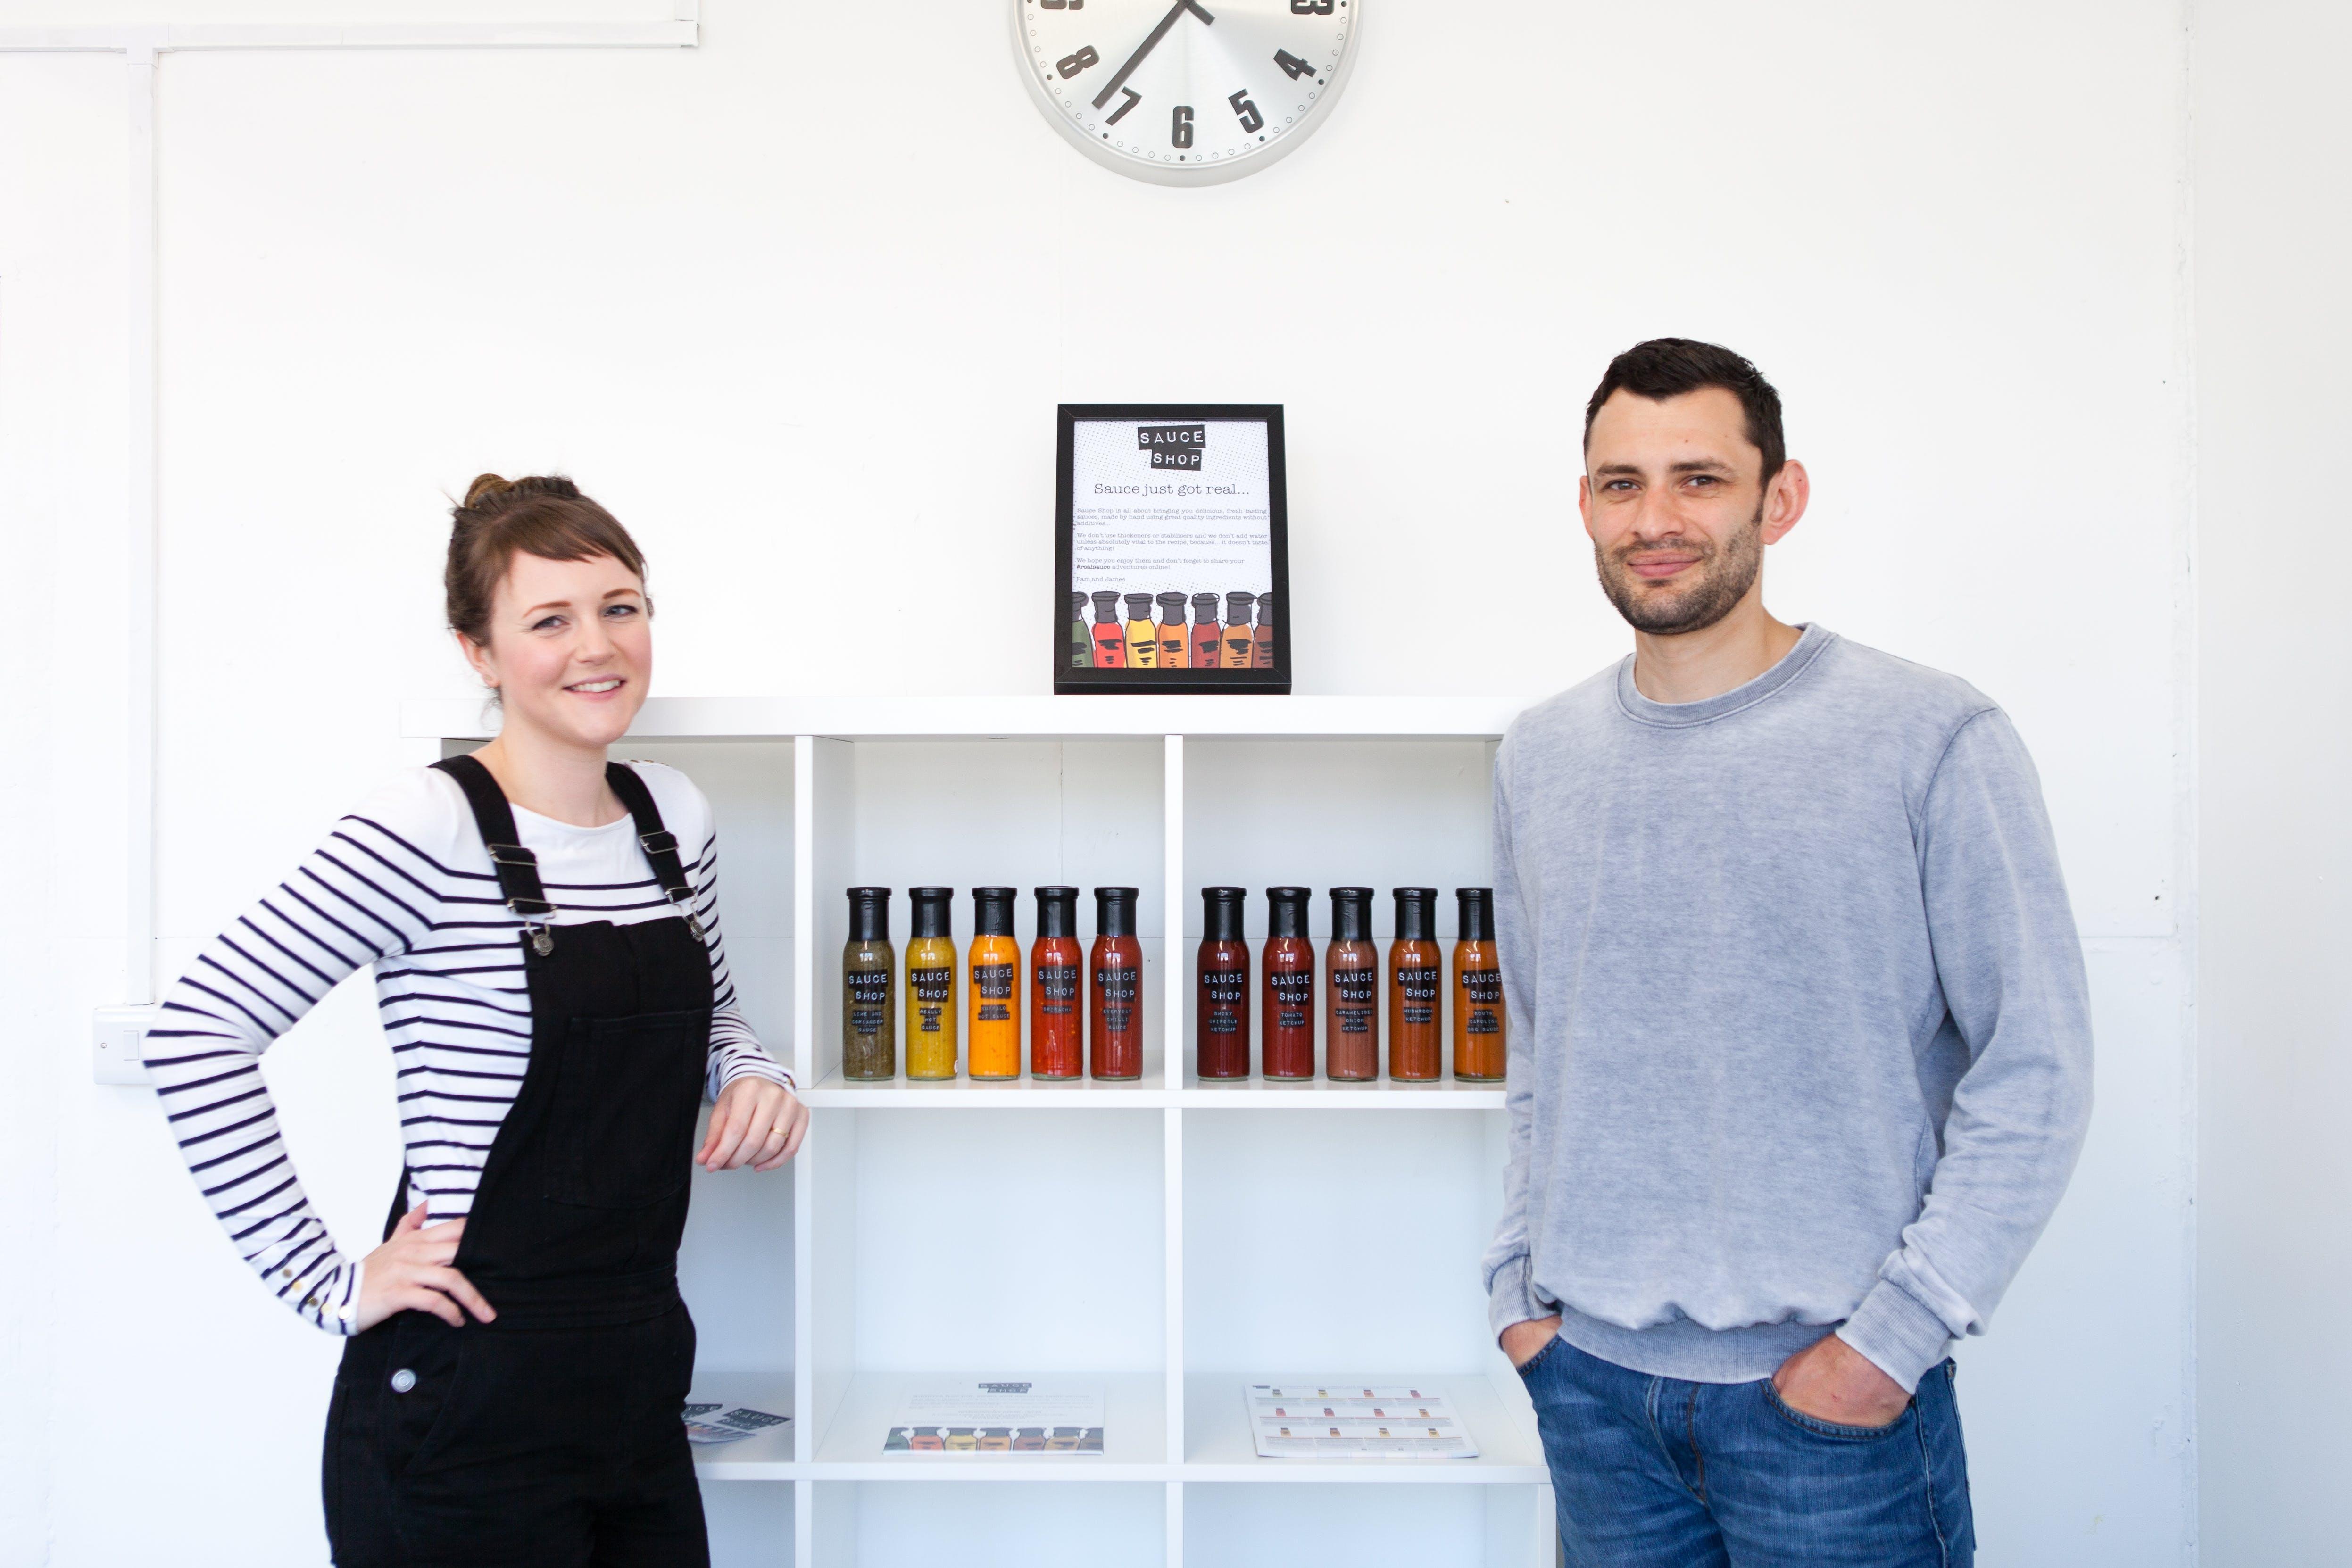 Sauce Shop - Farmdrop Local Food Delivery